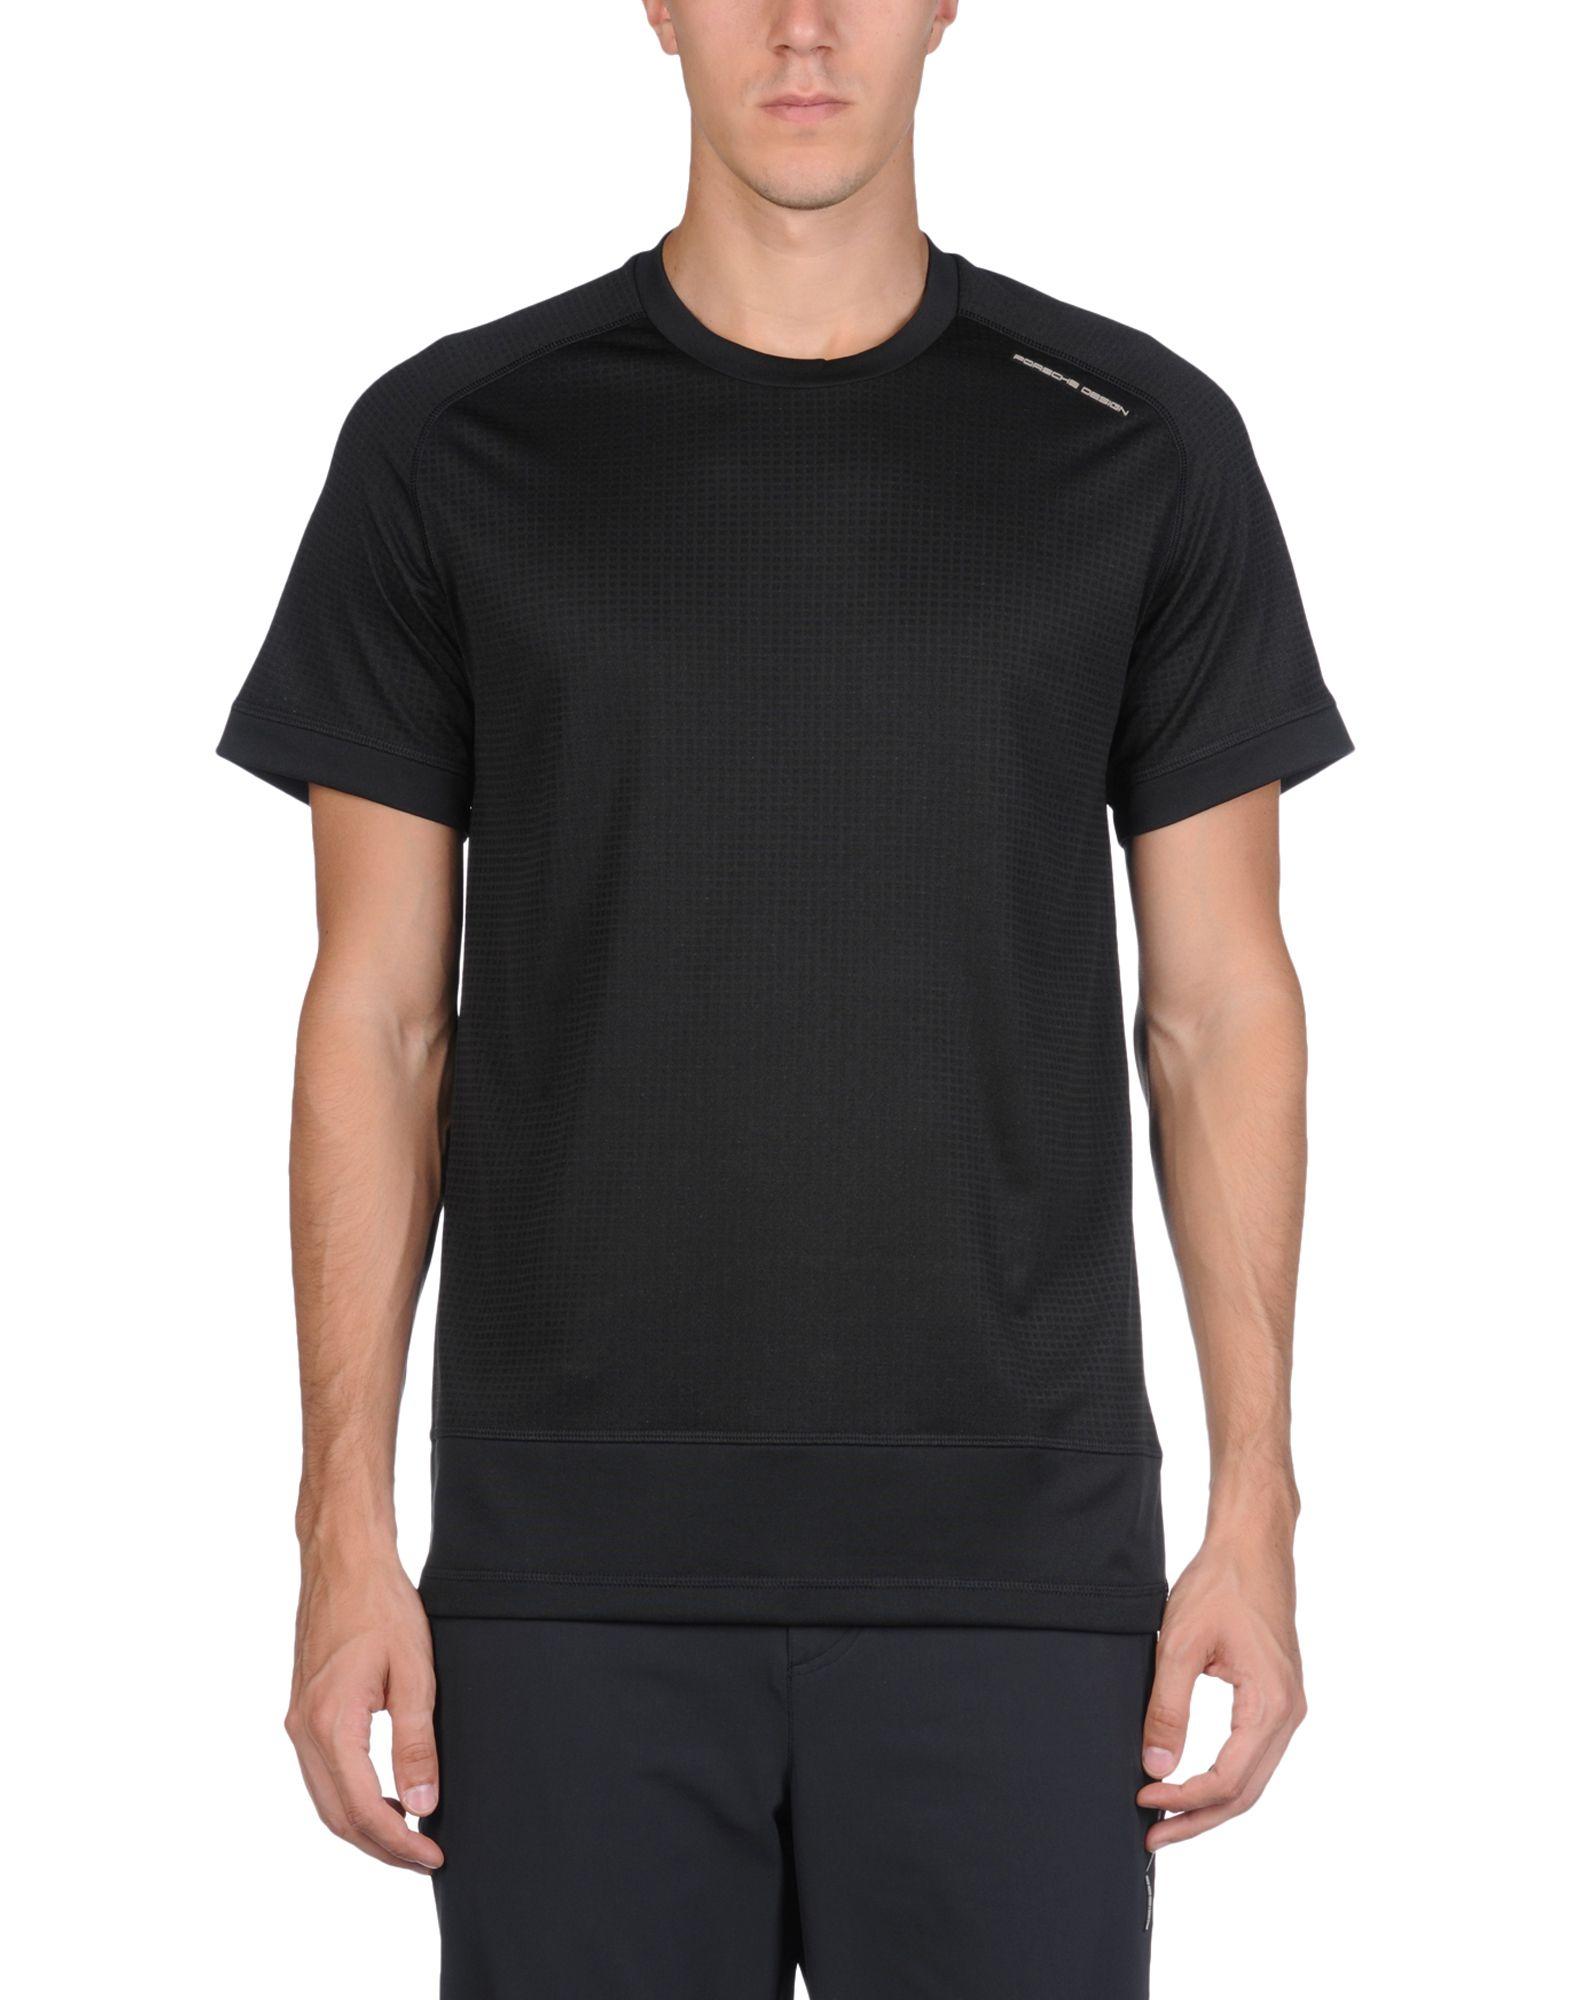 porsche design sport by adidas t shirt in black for men lyst. Black Bedroom Furniture Sets. Home Design Ideas